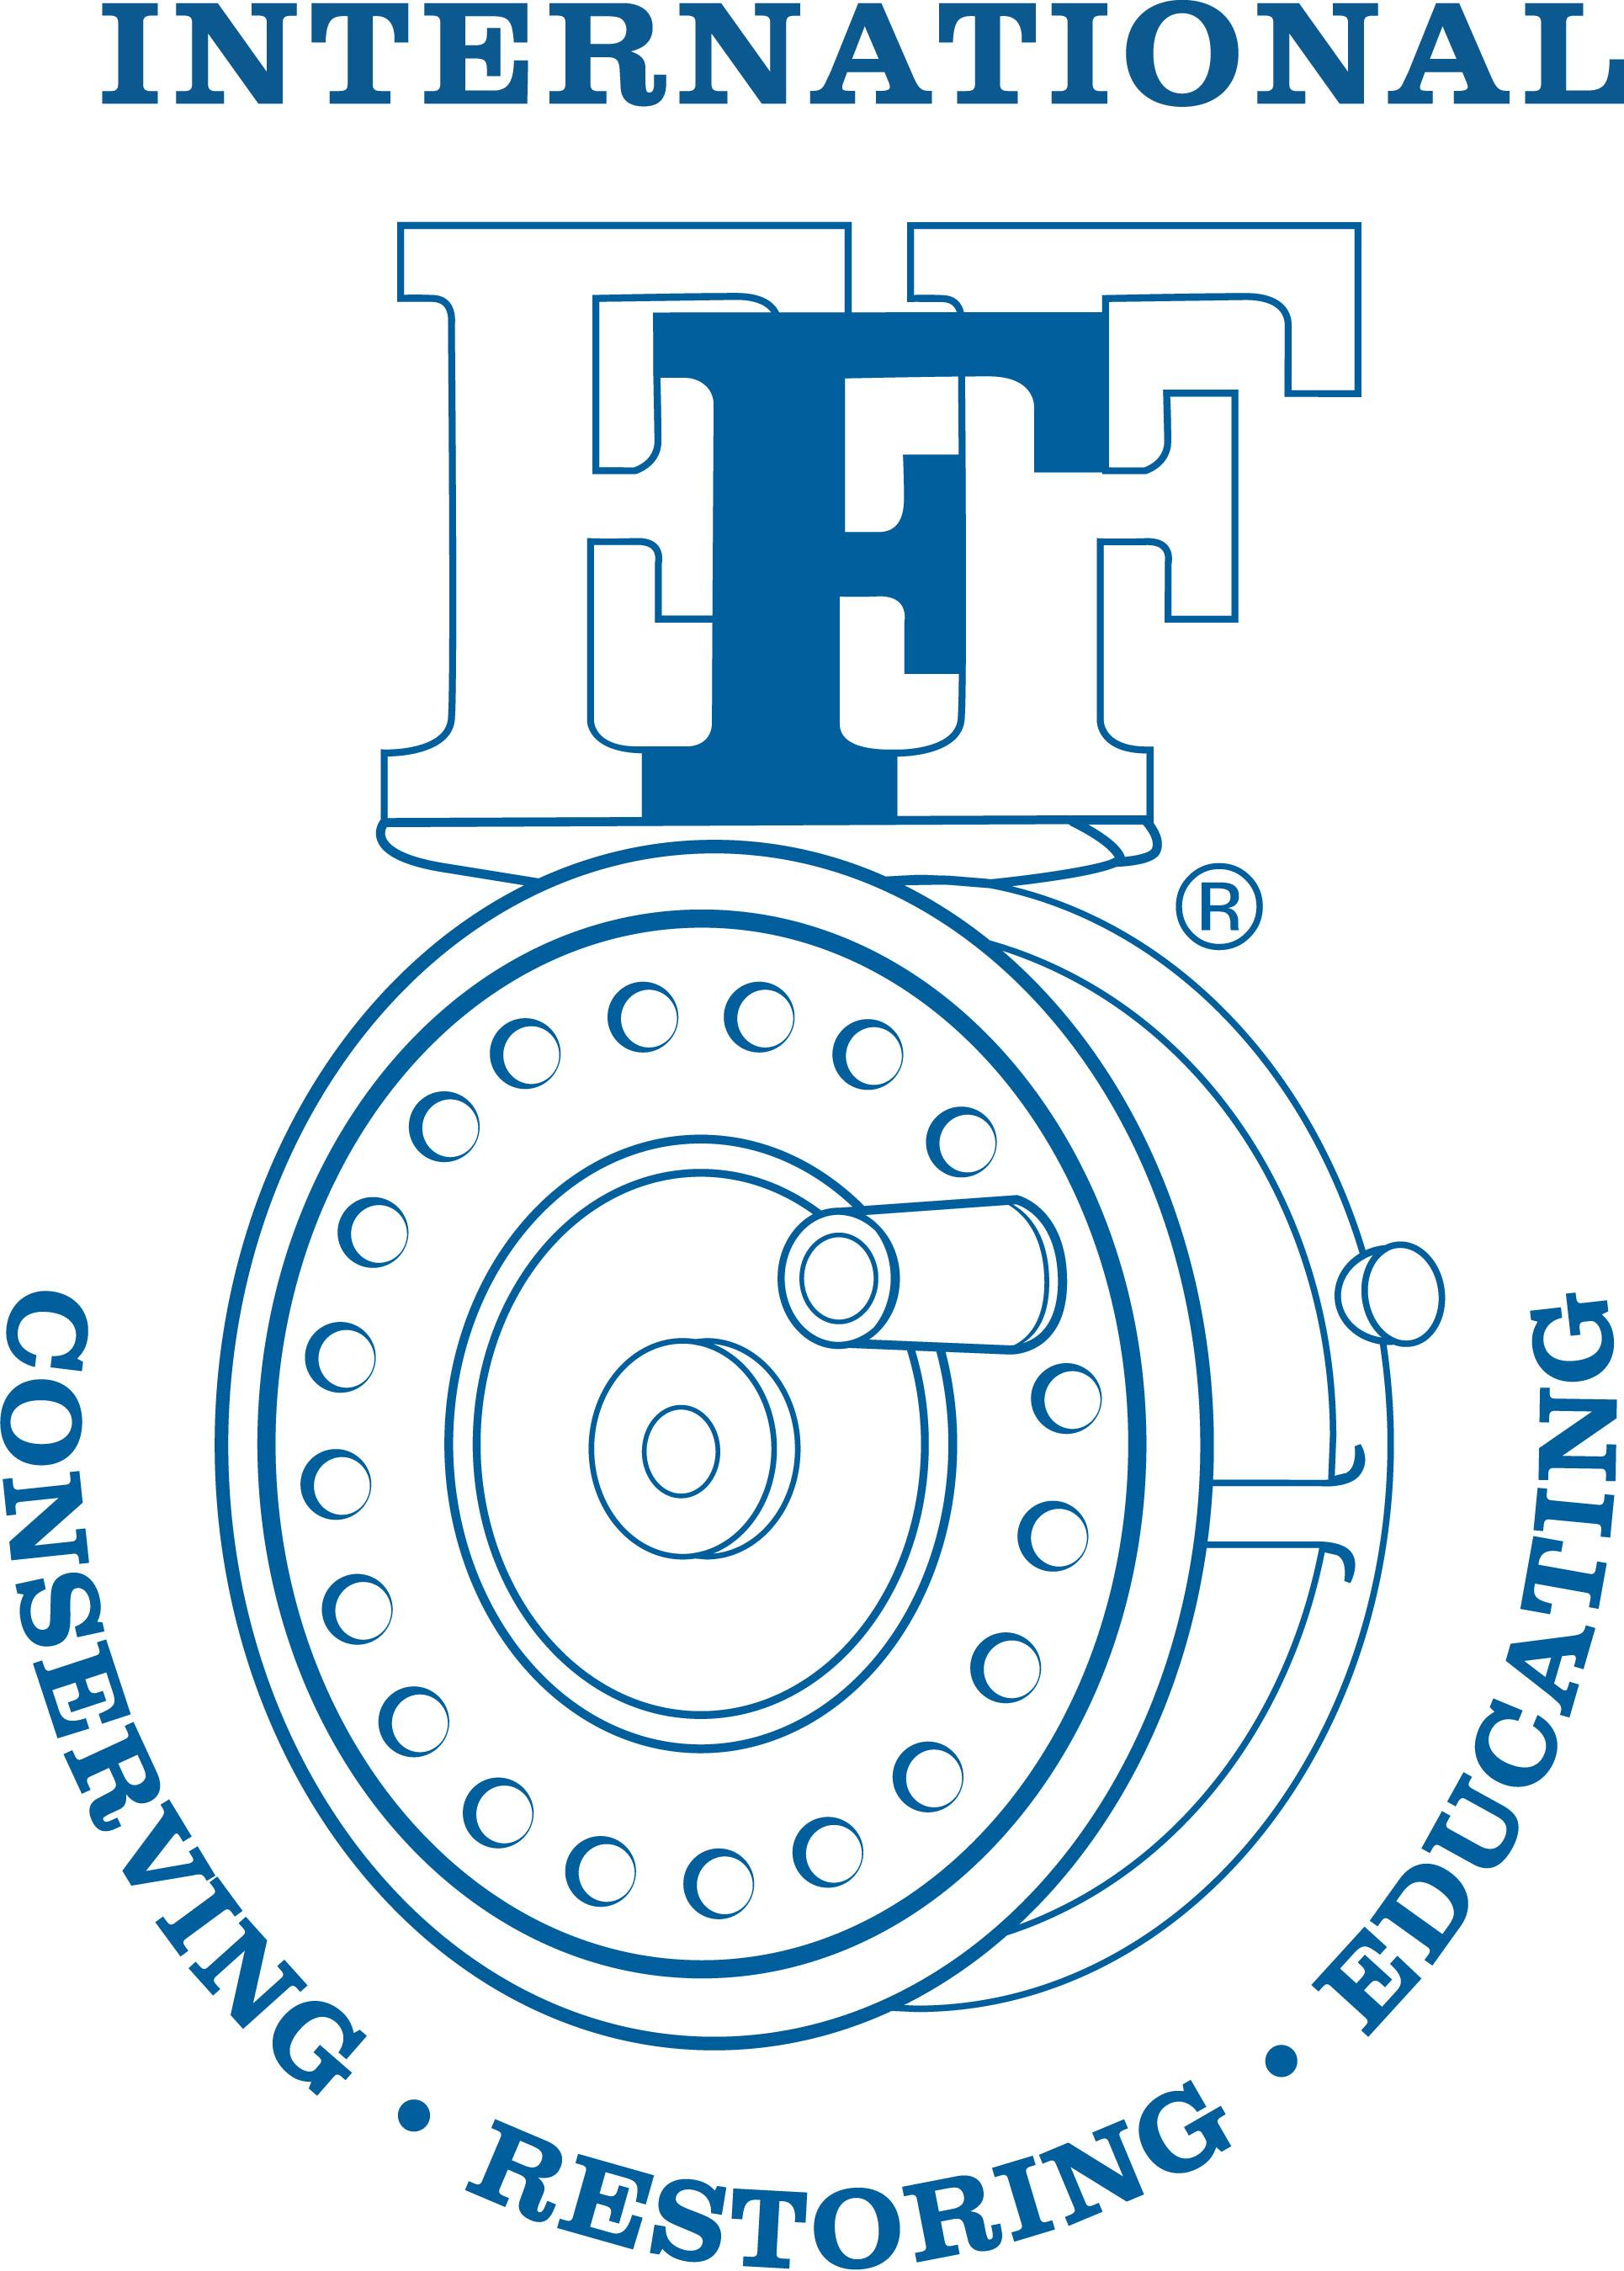 IFFF Logo blue-white w-mission.jpg